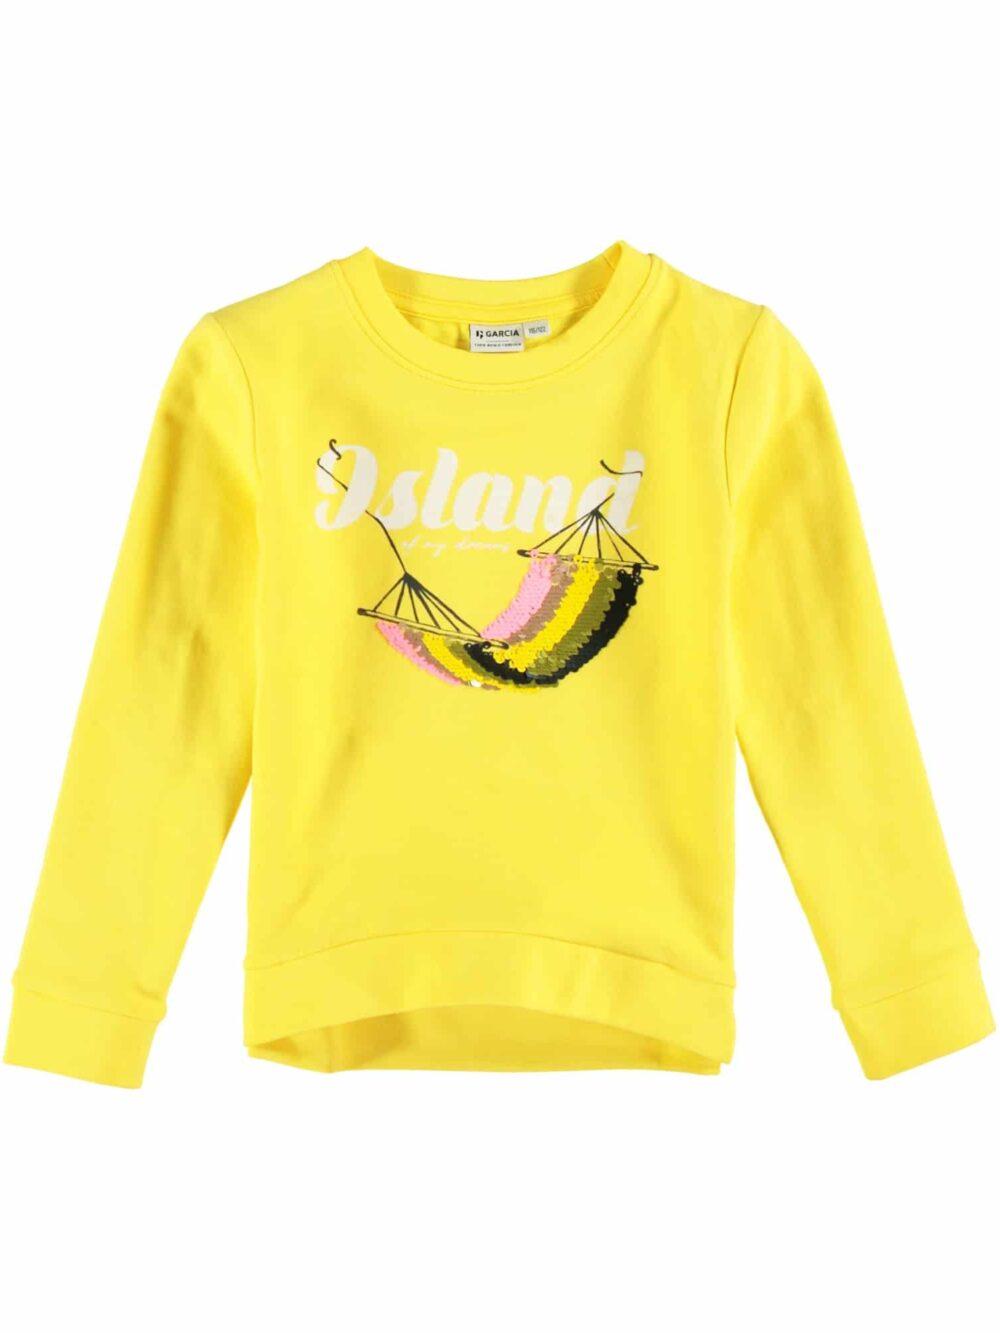 Garcia Sweatshirt P04460 Fire Yellow